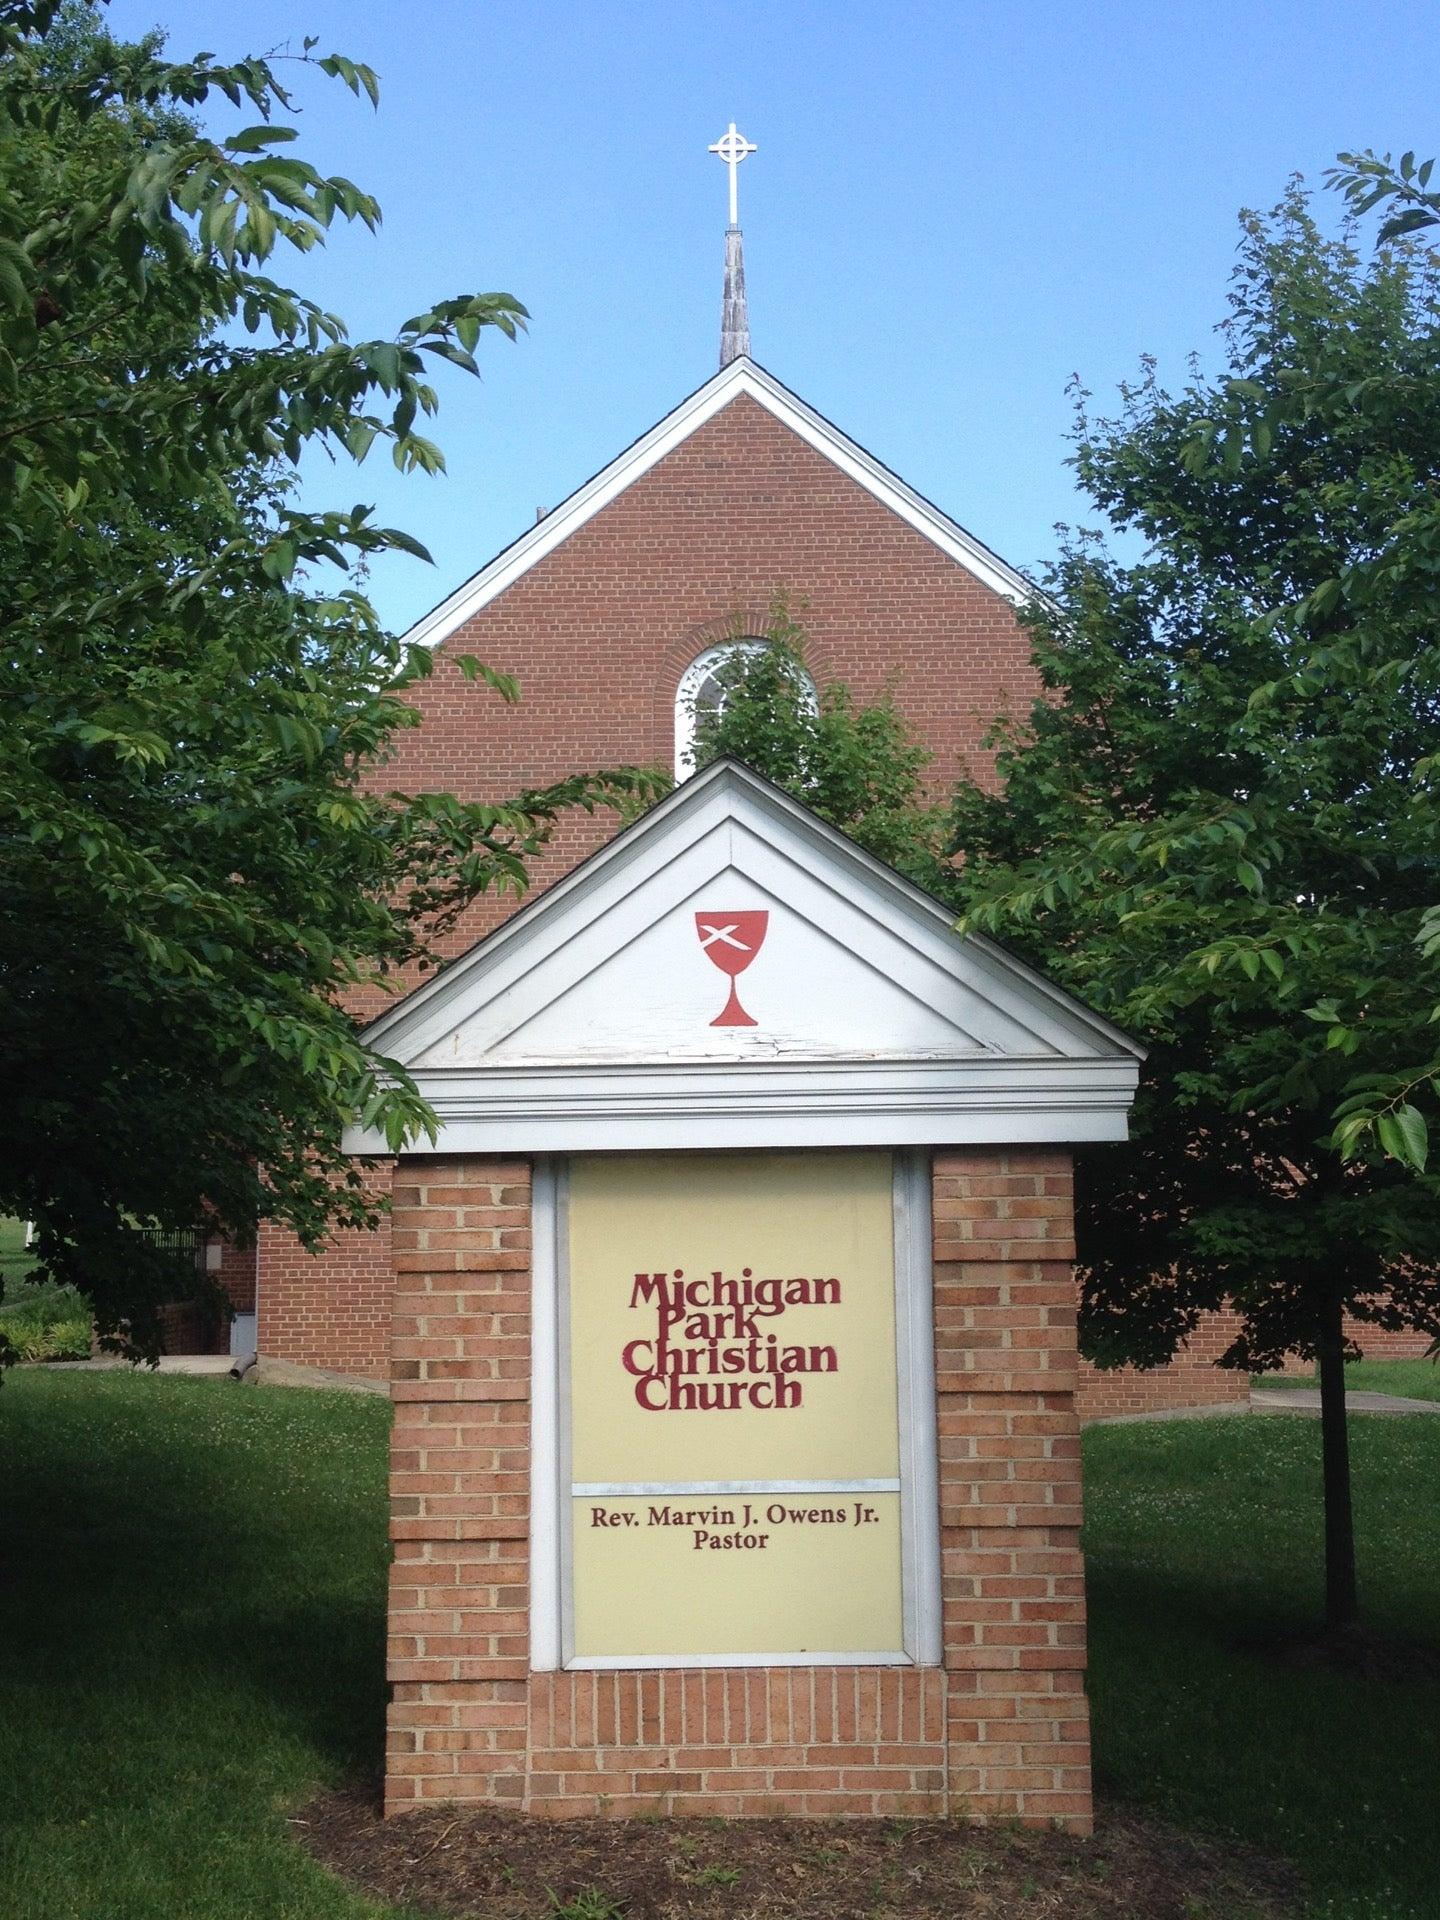 Michigan Park Christian Church,